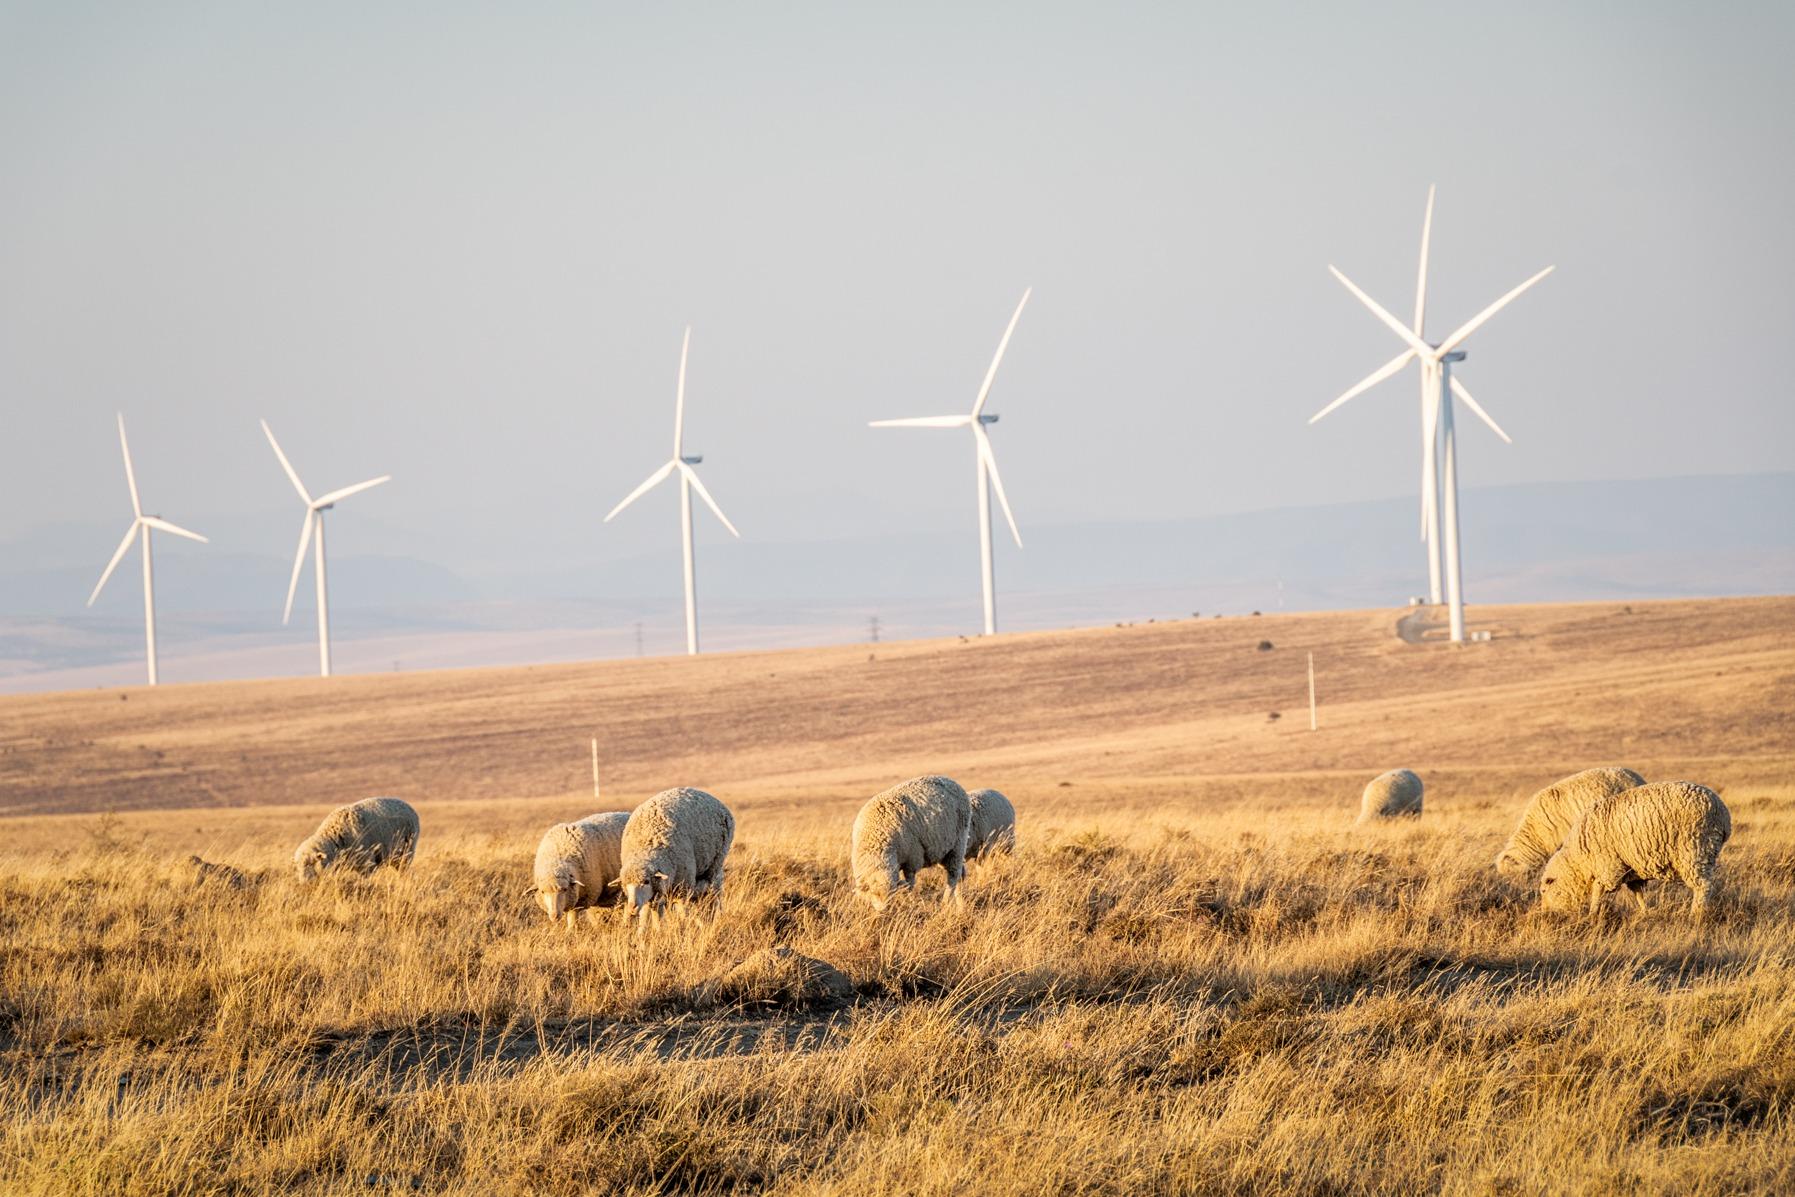 Sheep and Windfarm